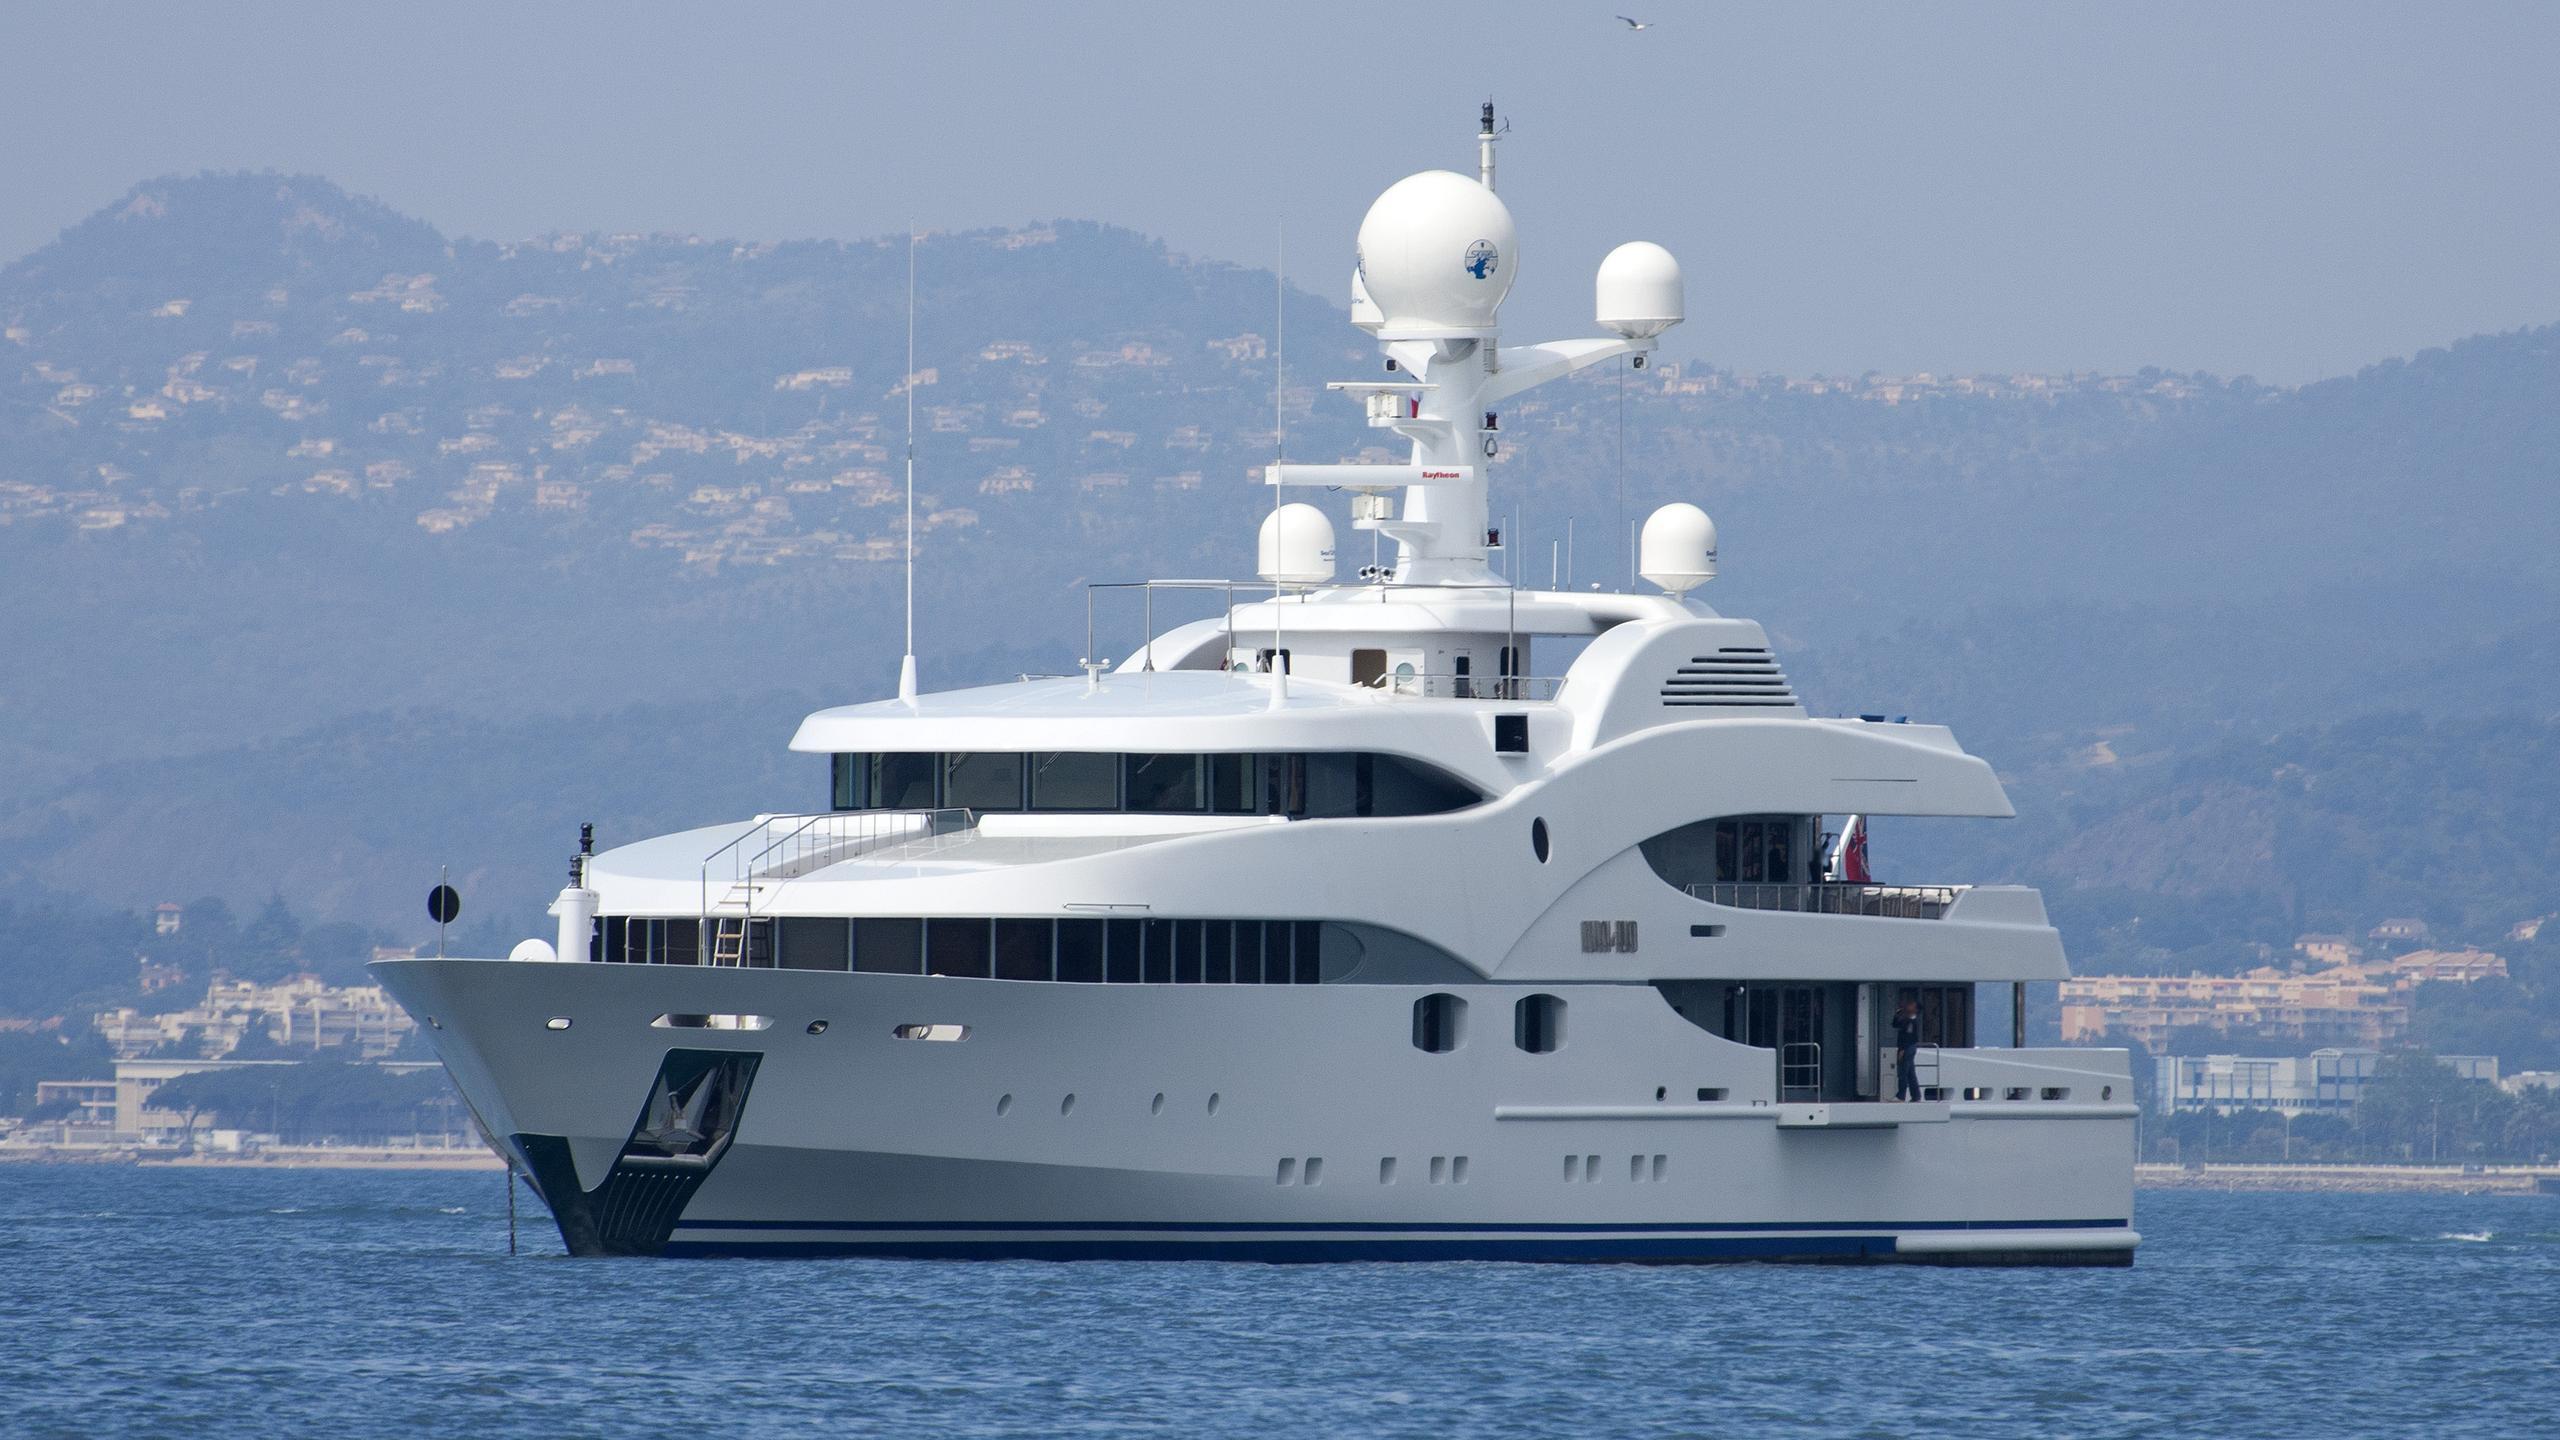 nourah-of-riyad-motor-yacht-yachtley-2008-70m-profile